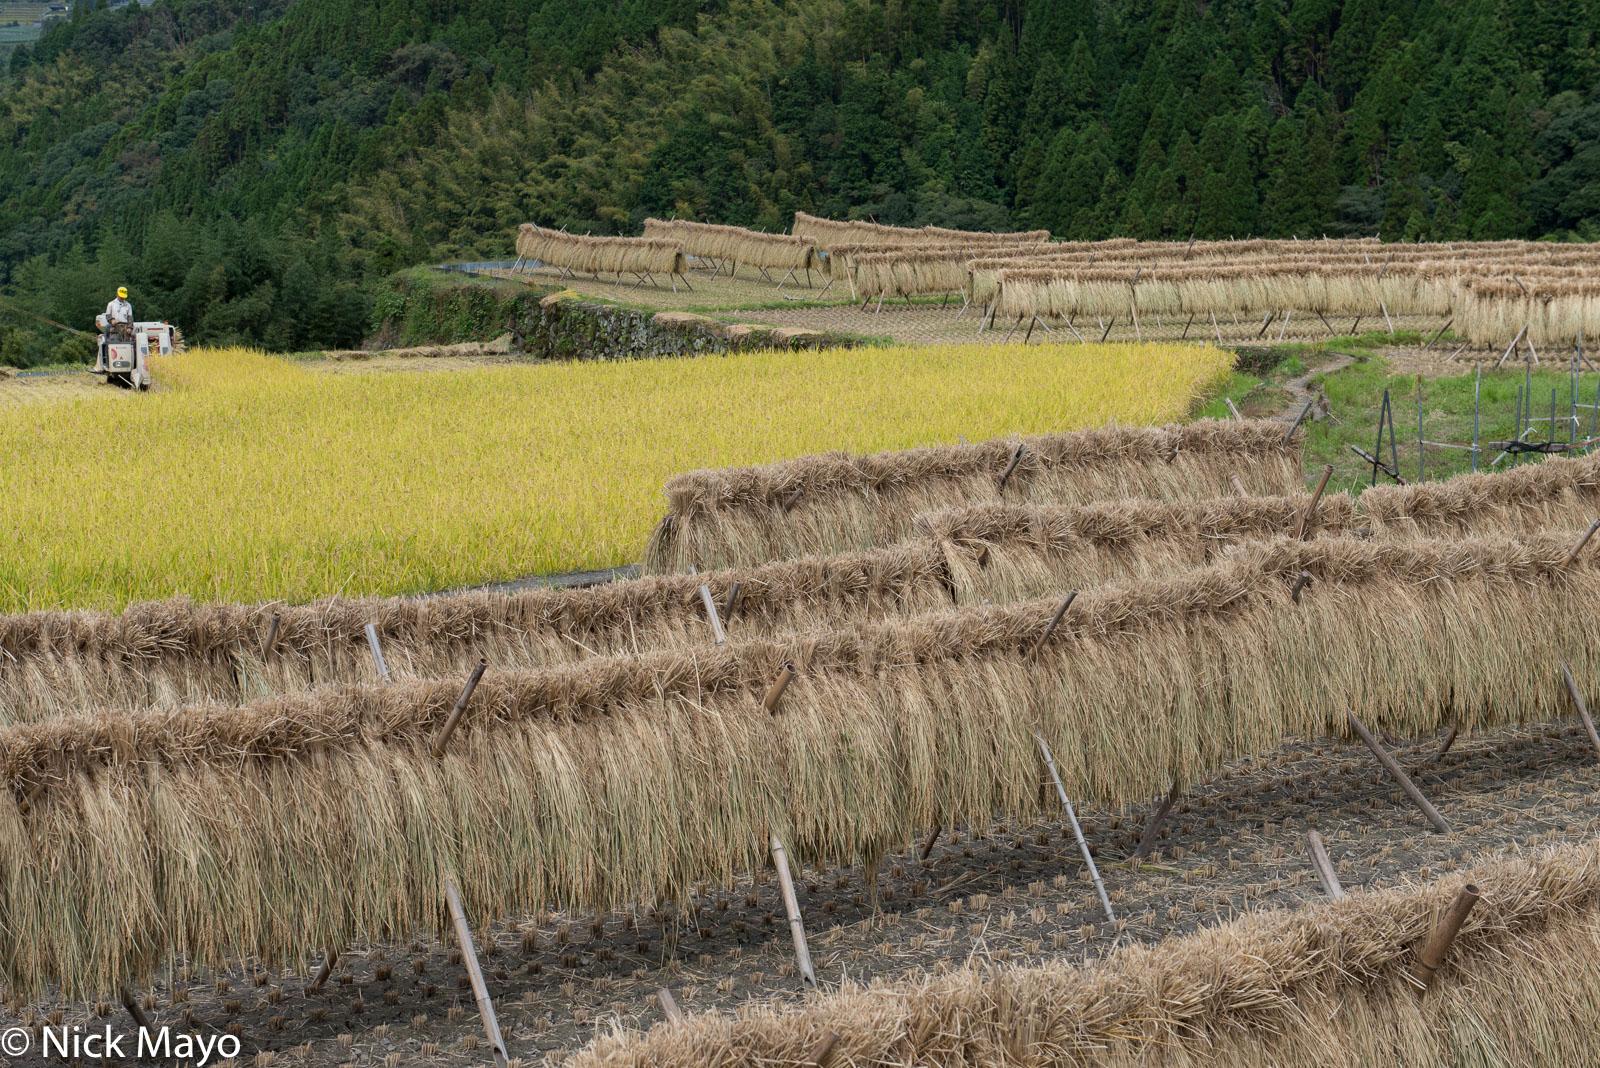 Drying Rack,Harvesting,Japan,Kyushu,Paddy, photo